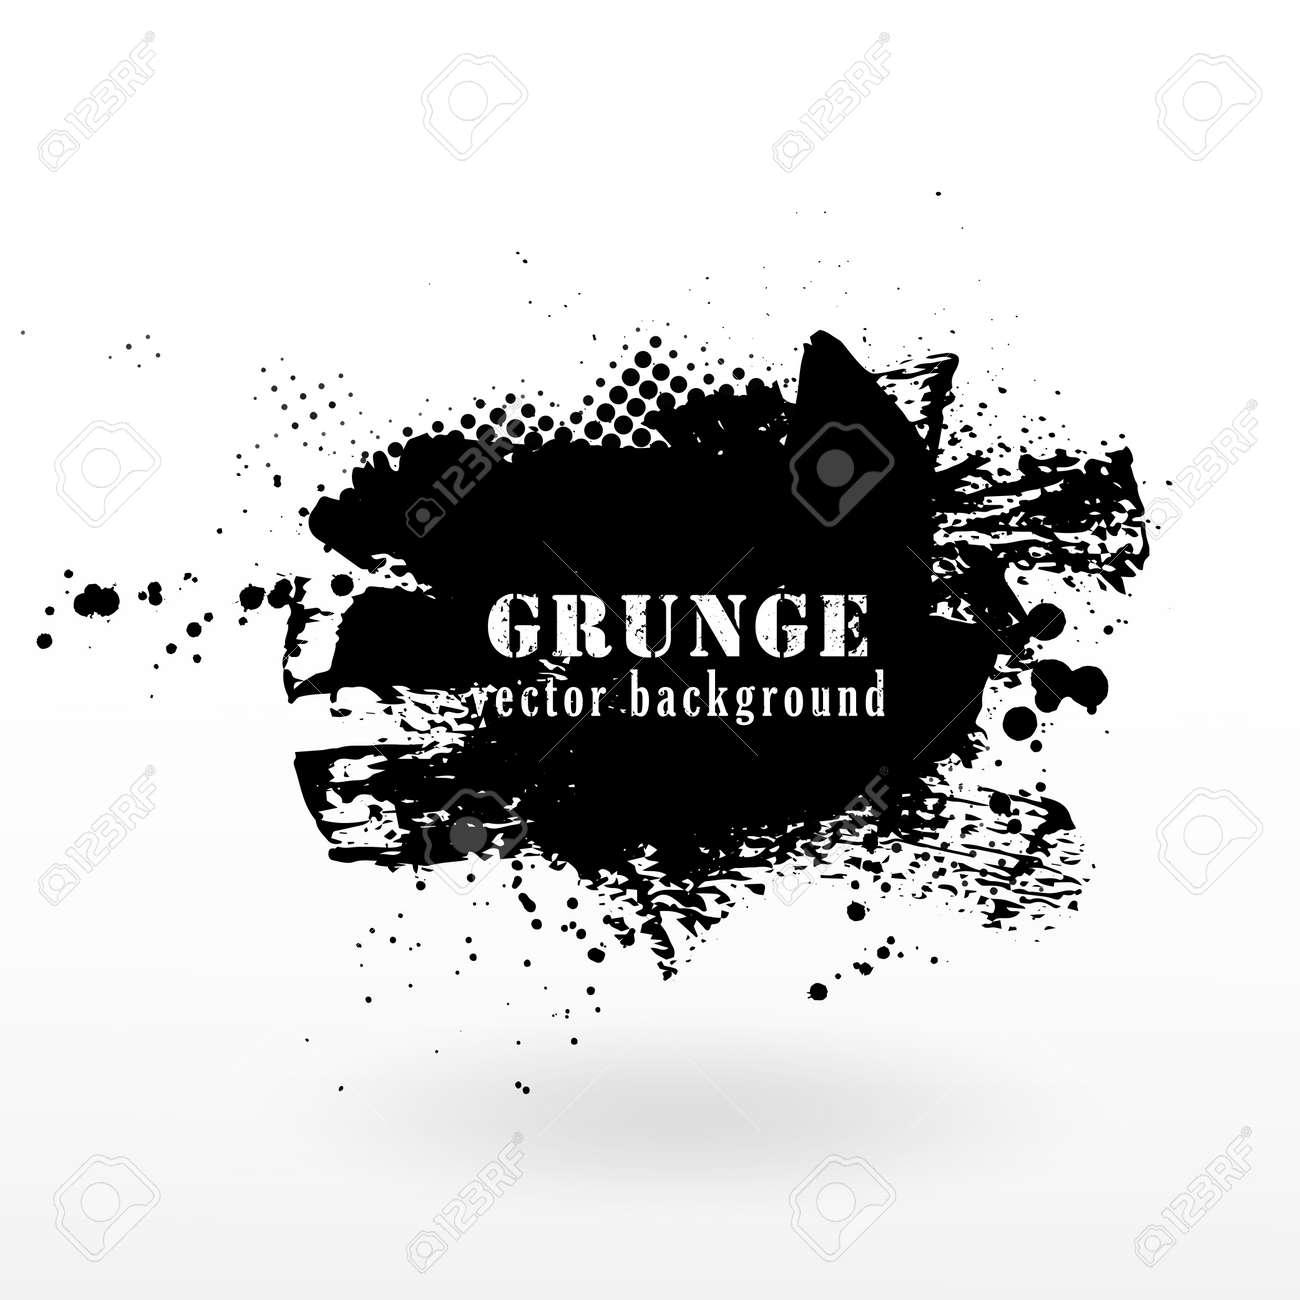 Vector grunge banner background. Grunge texture halftone and black ink splatter. - 165568002